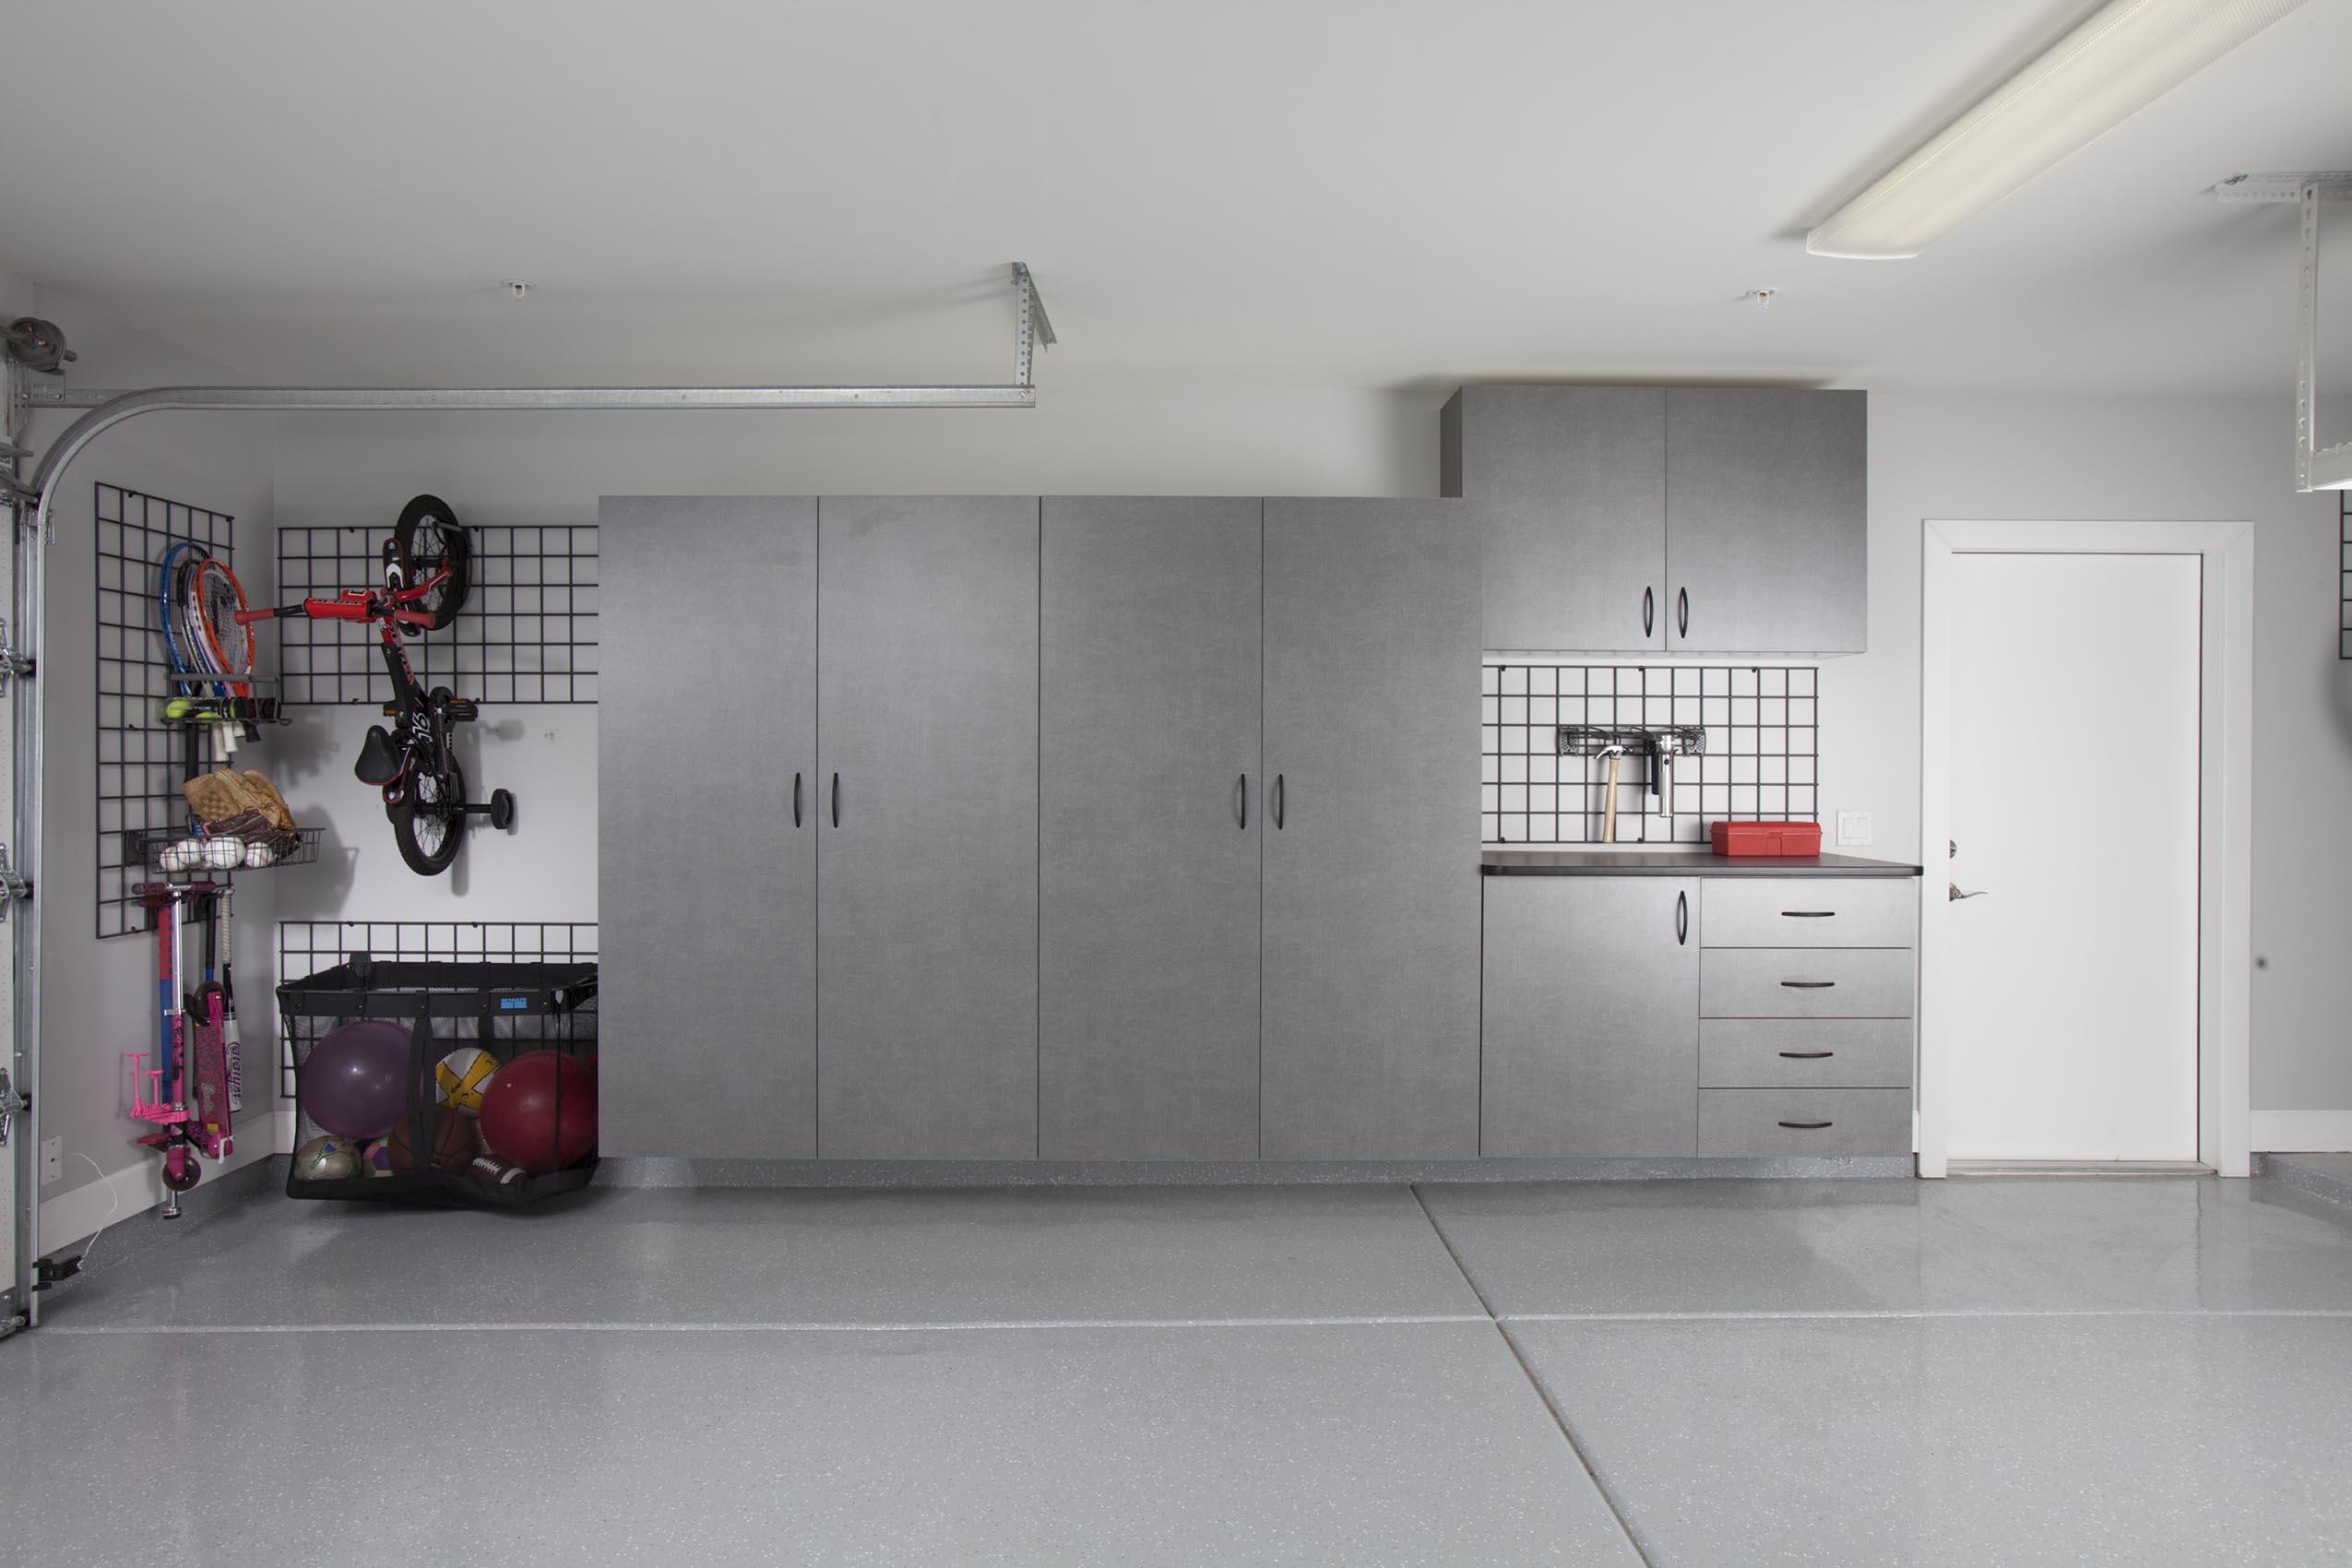 Pewter Garage with Workbench